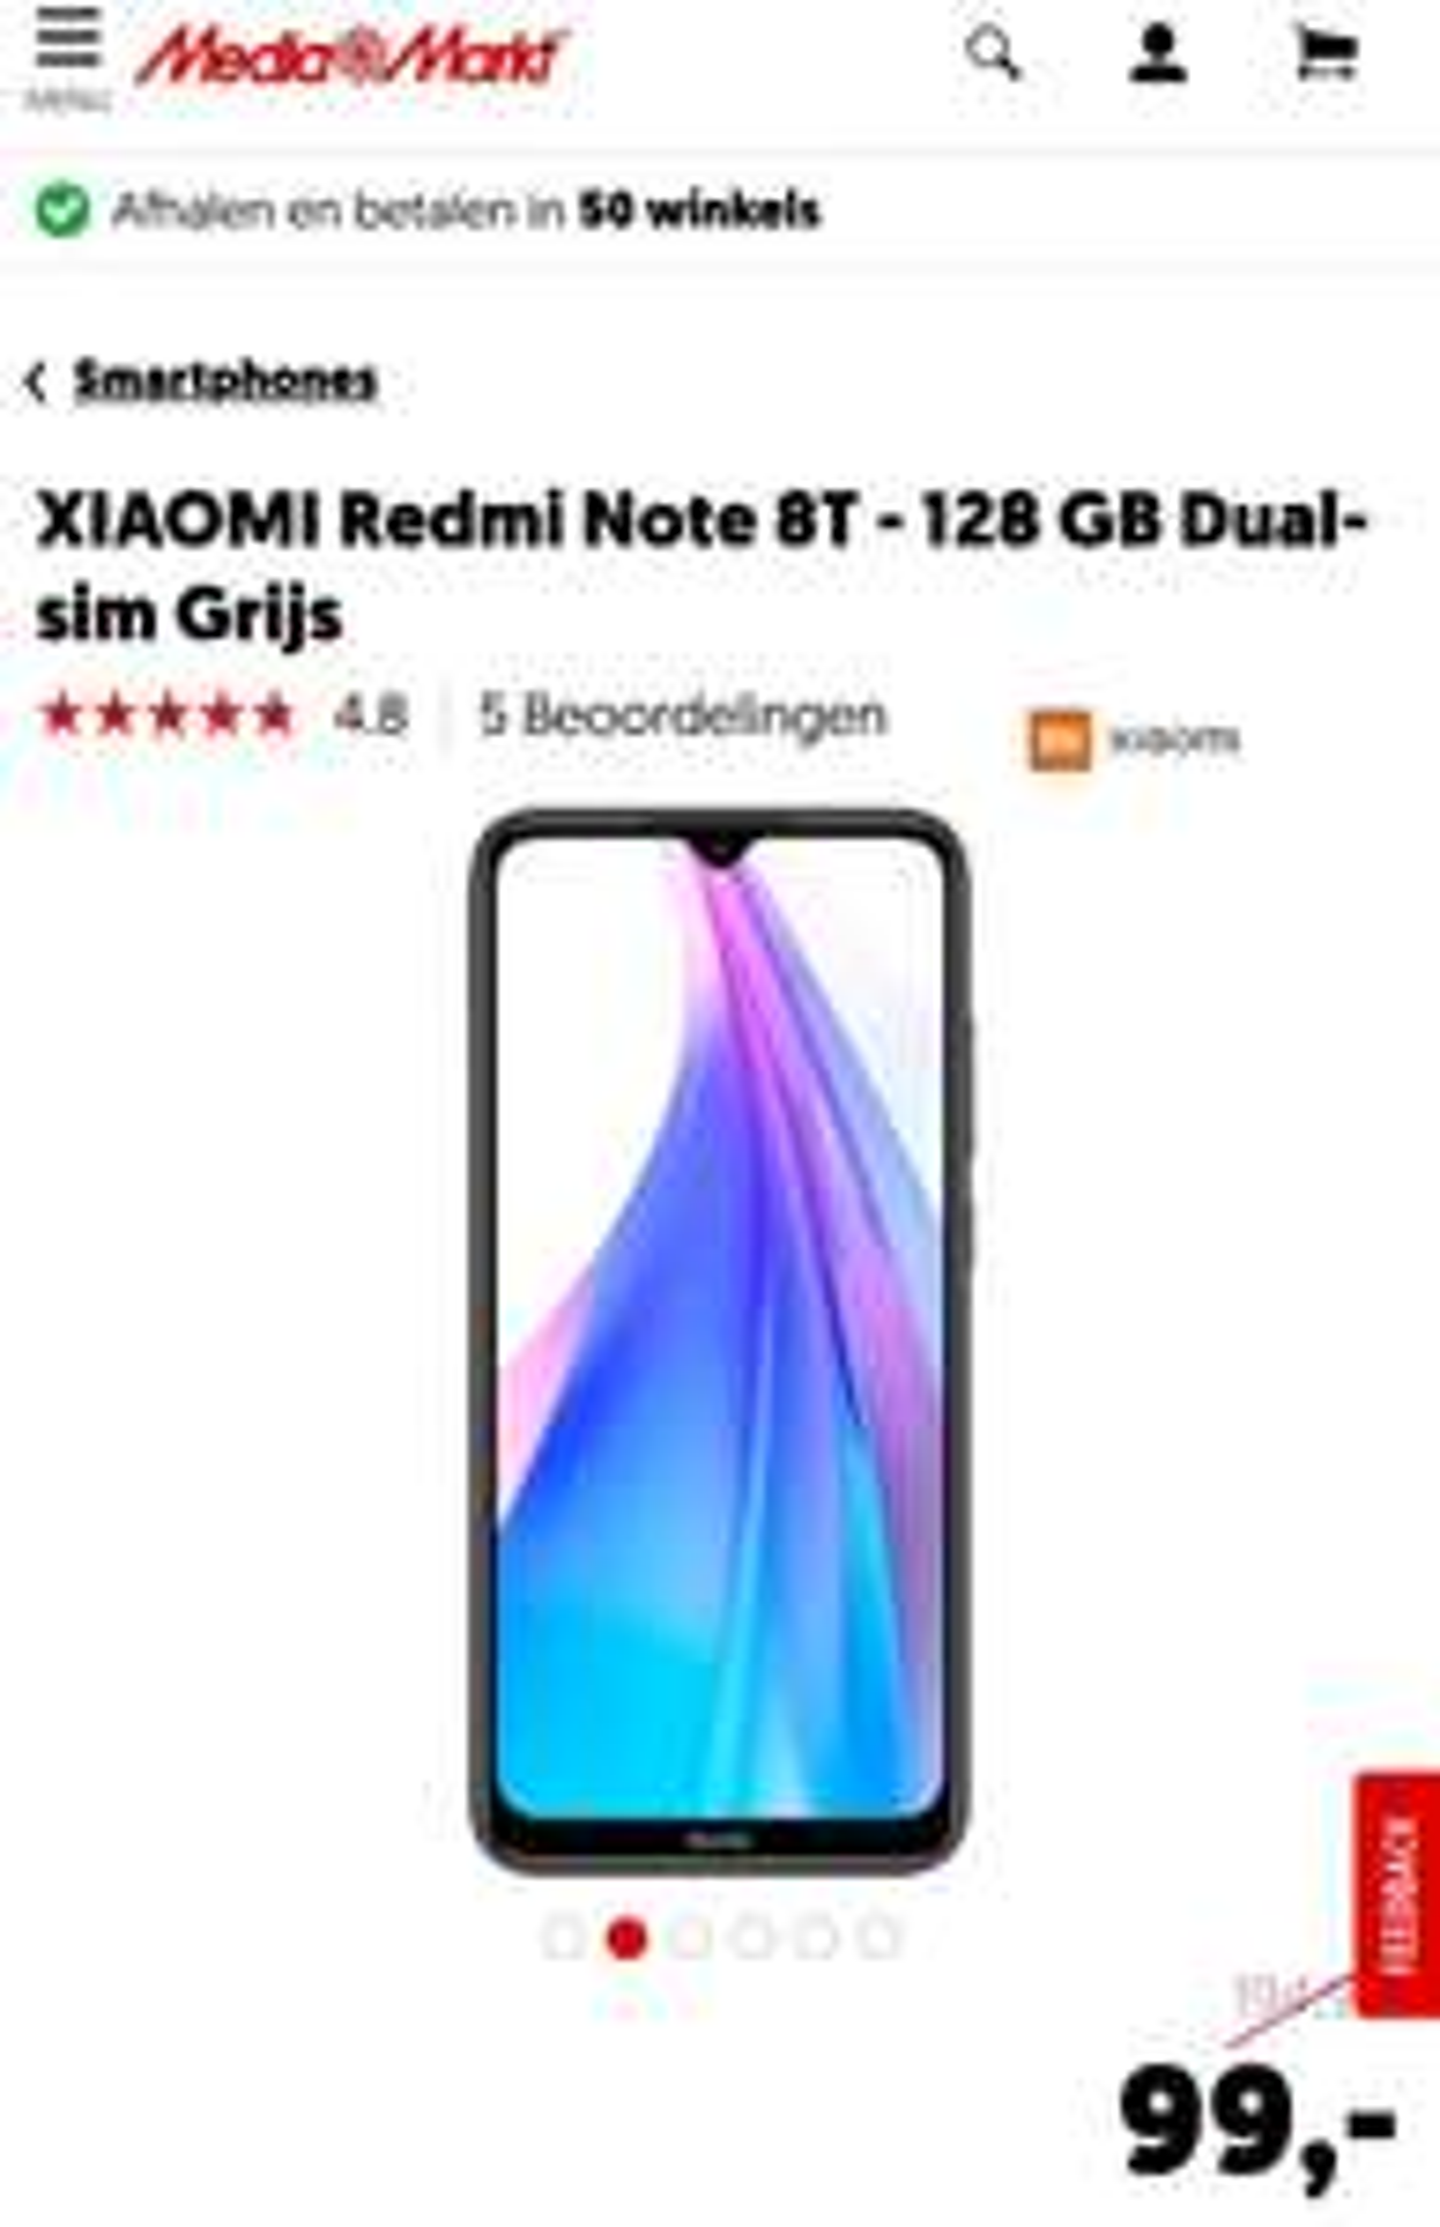 XIAOMI Redmi Note 8T - 128 GB/ 4gb Dual-sim